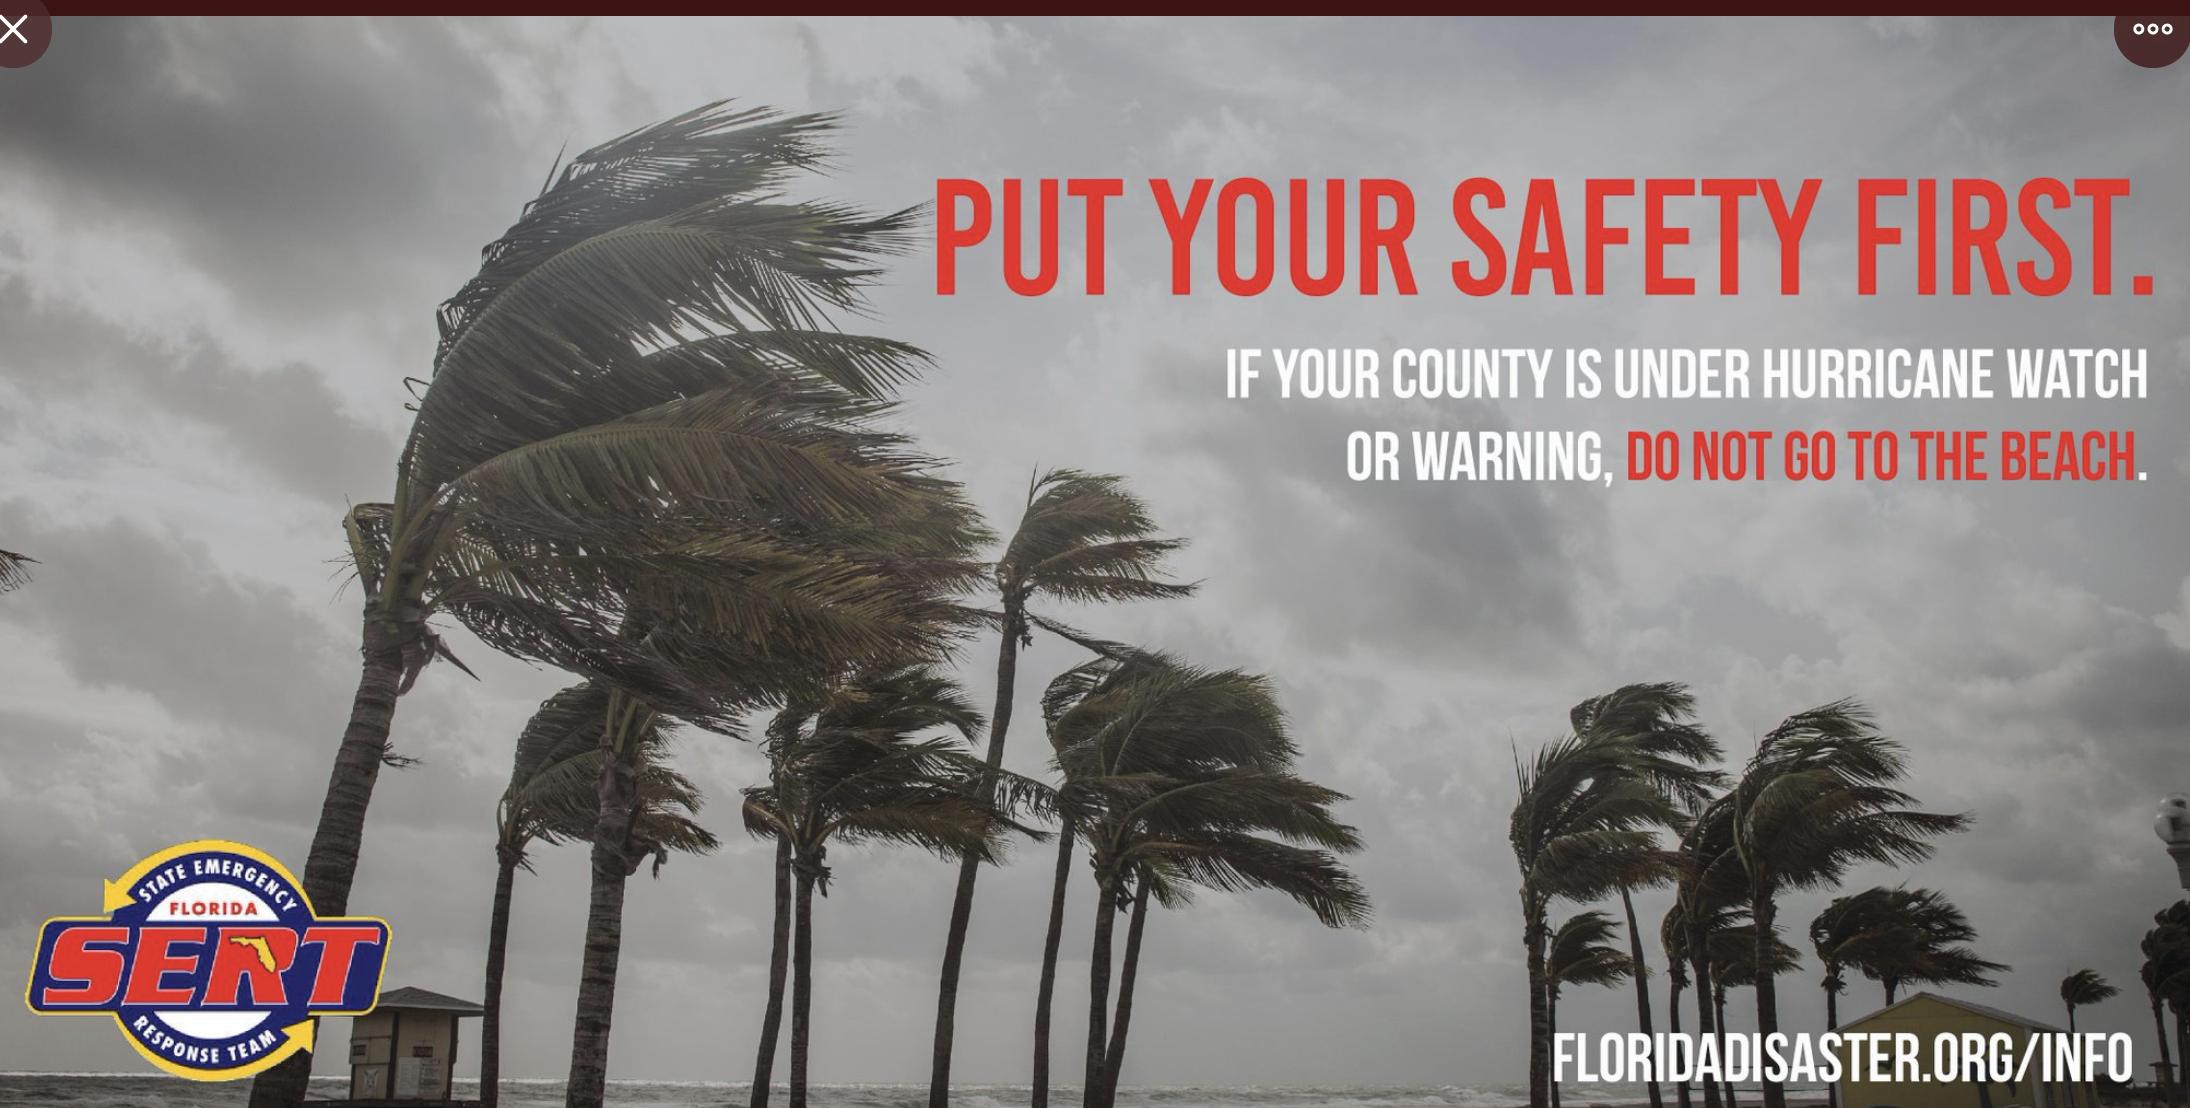 Treasure Coast Hurricane Dorian coverage Sept 3, 2019